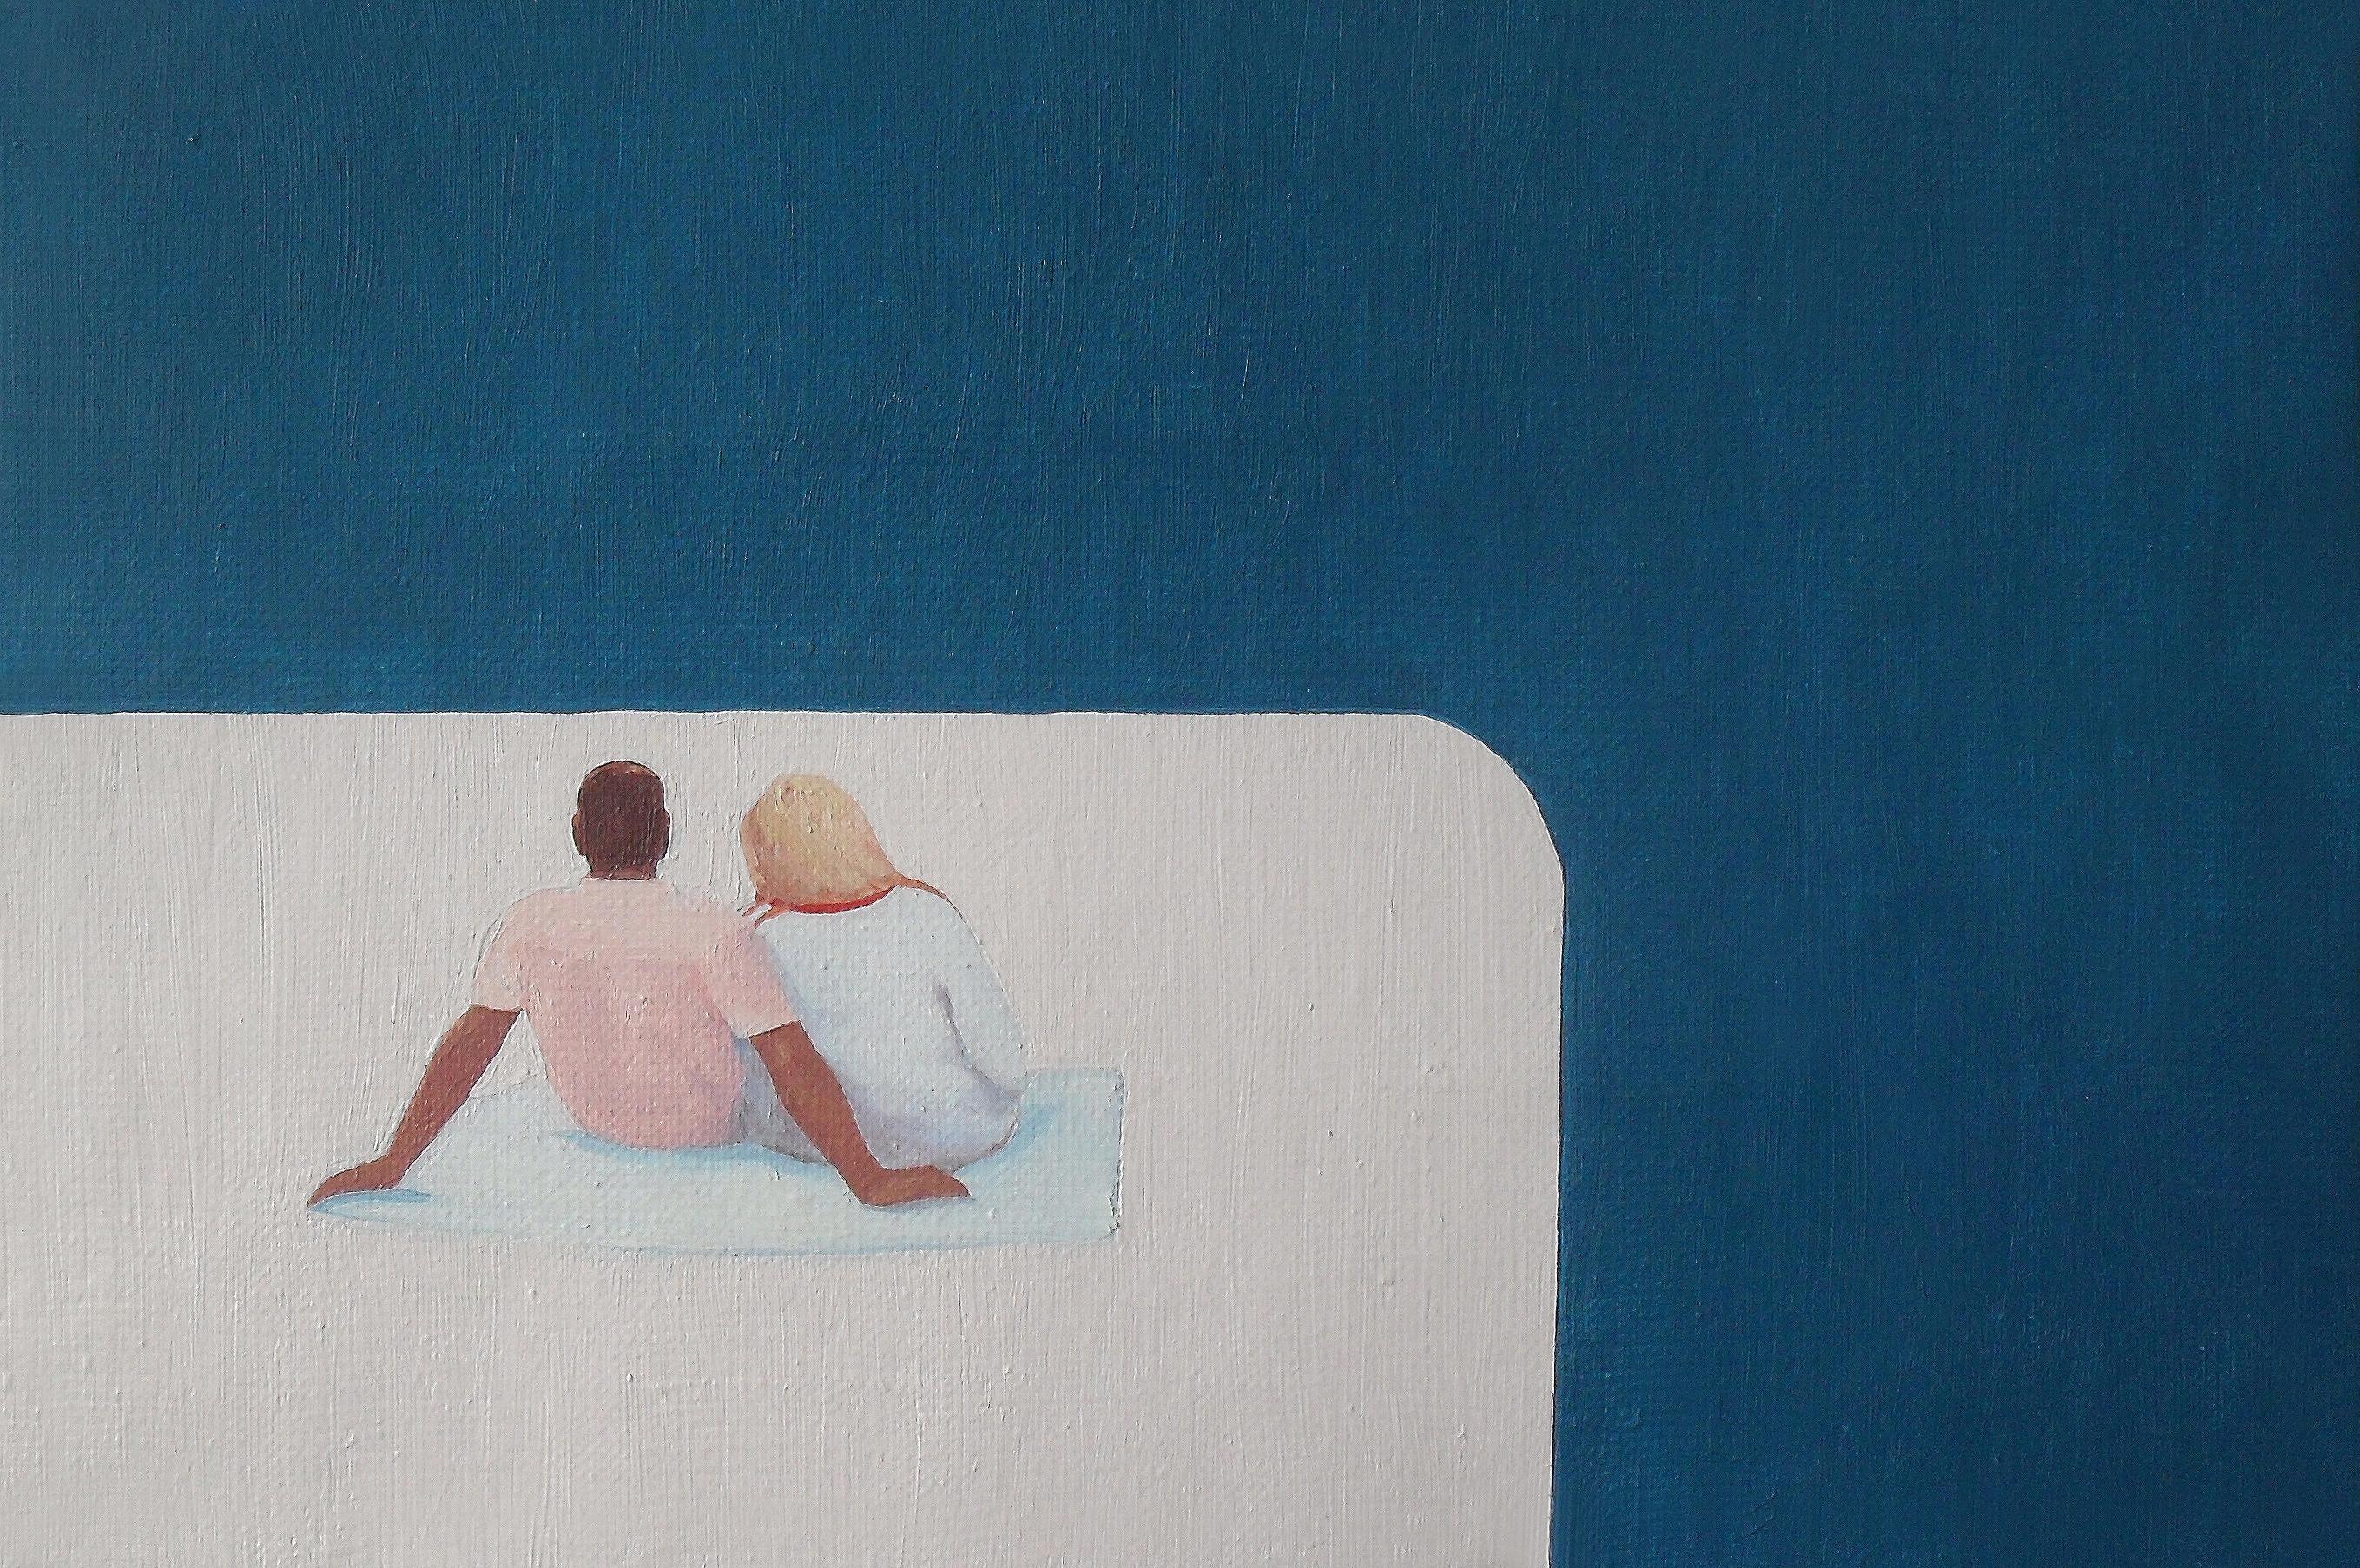 The Beach V - Modern Figurative Minimalistic Oil Painting, Sea View, Love